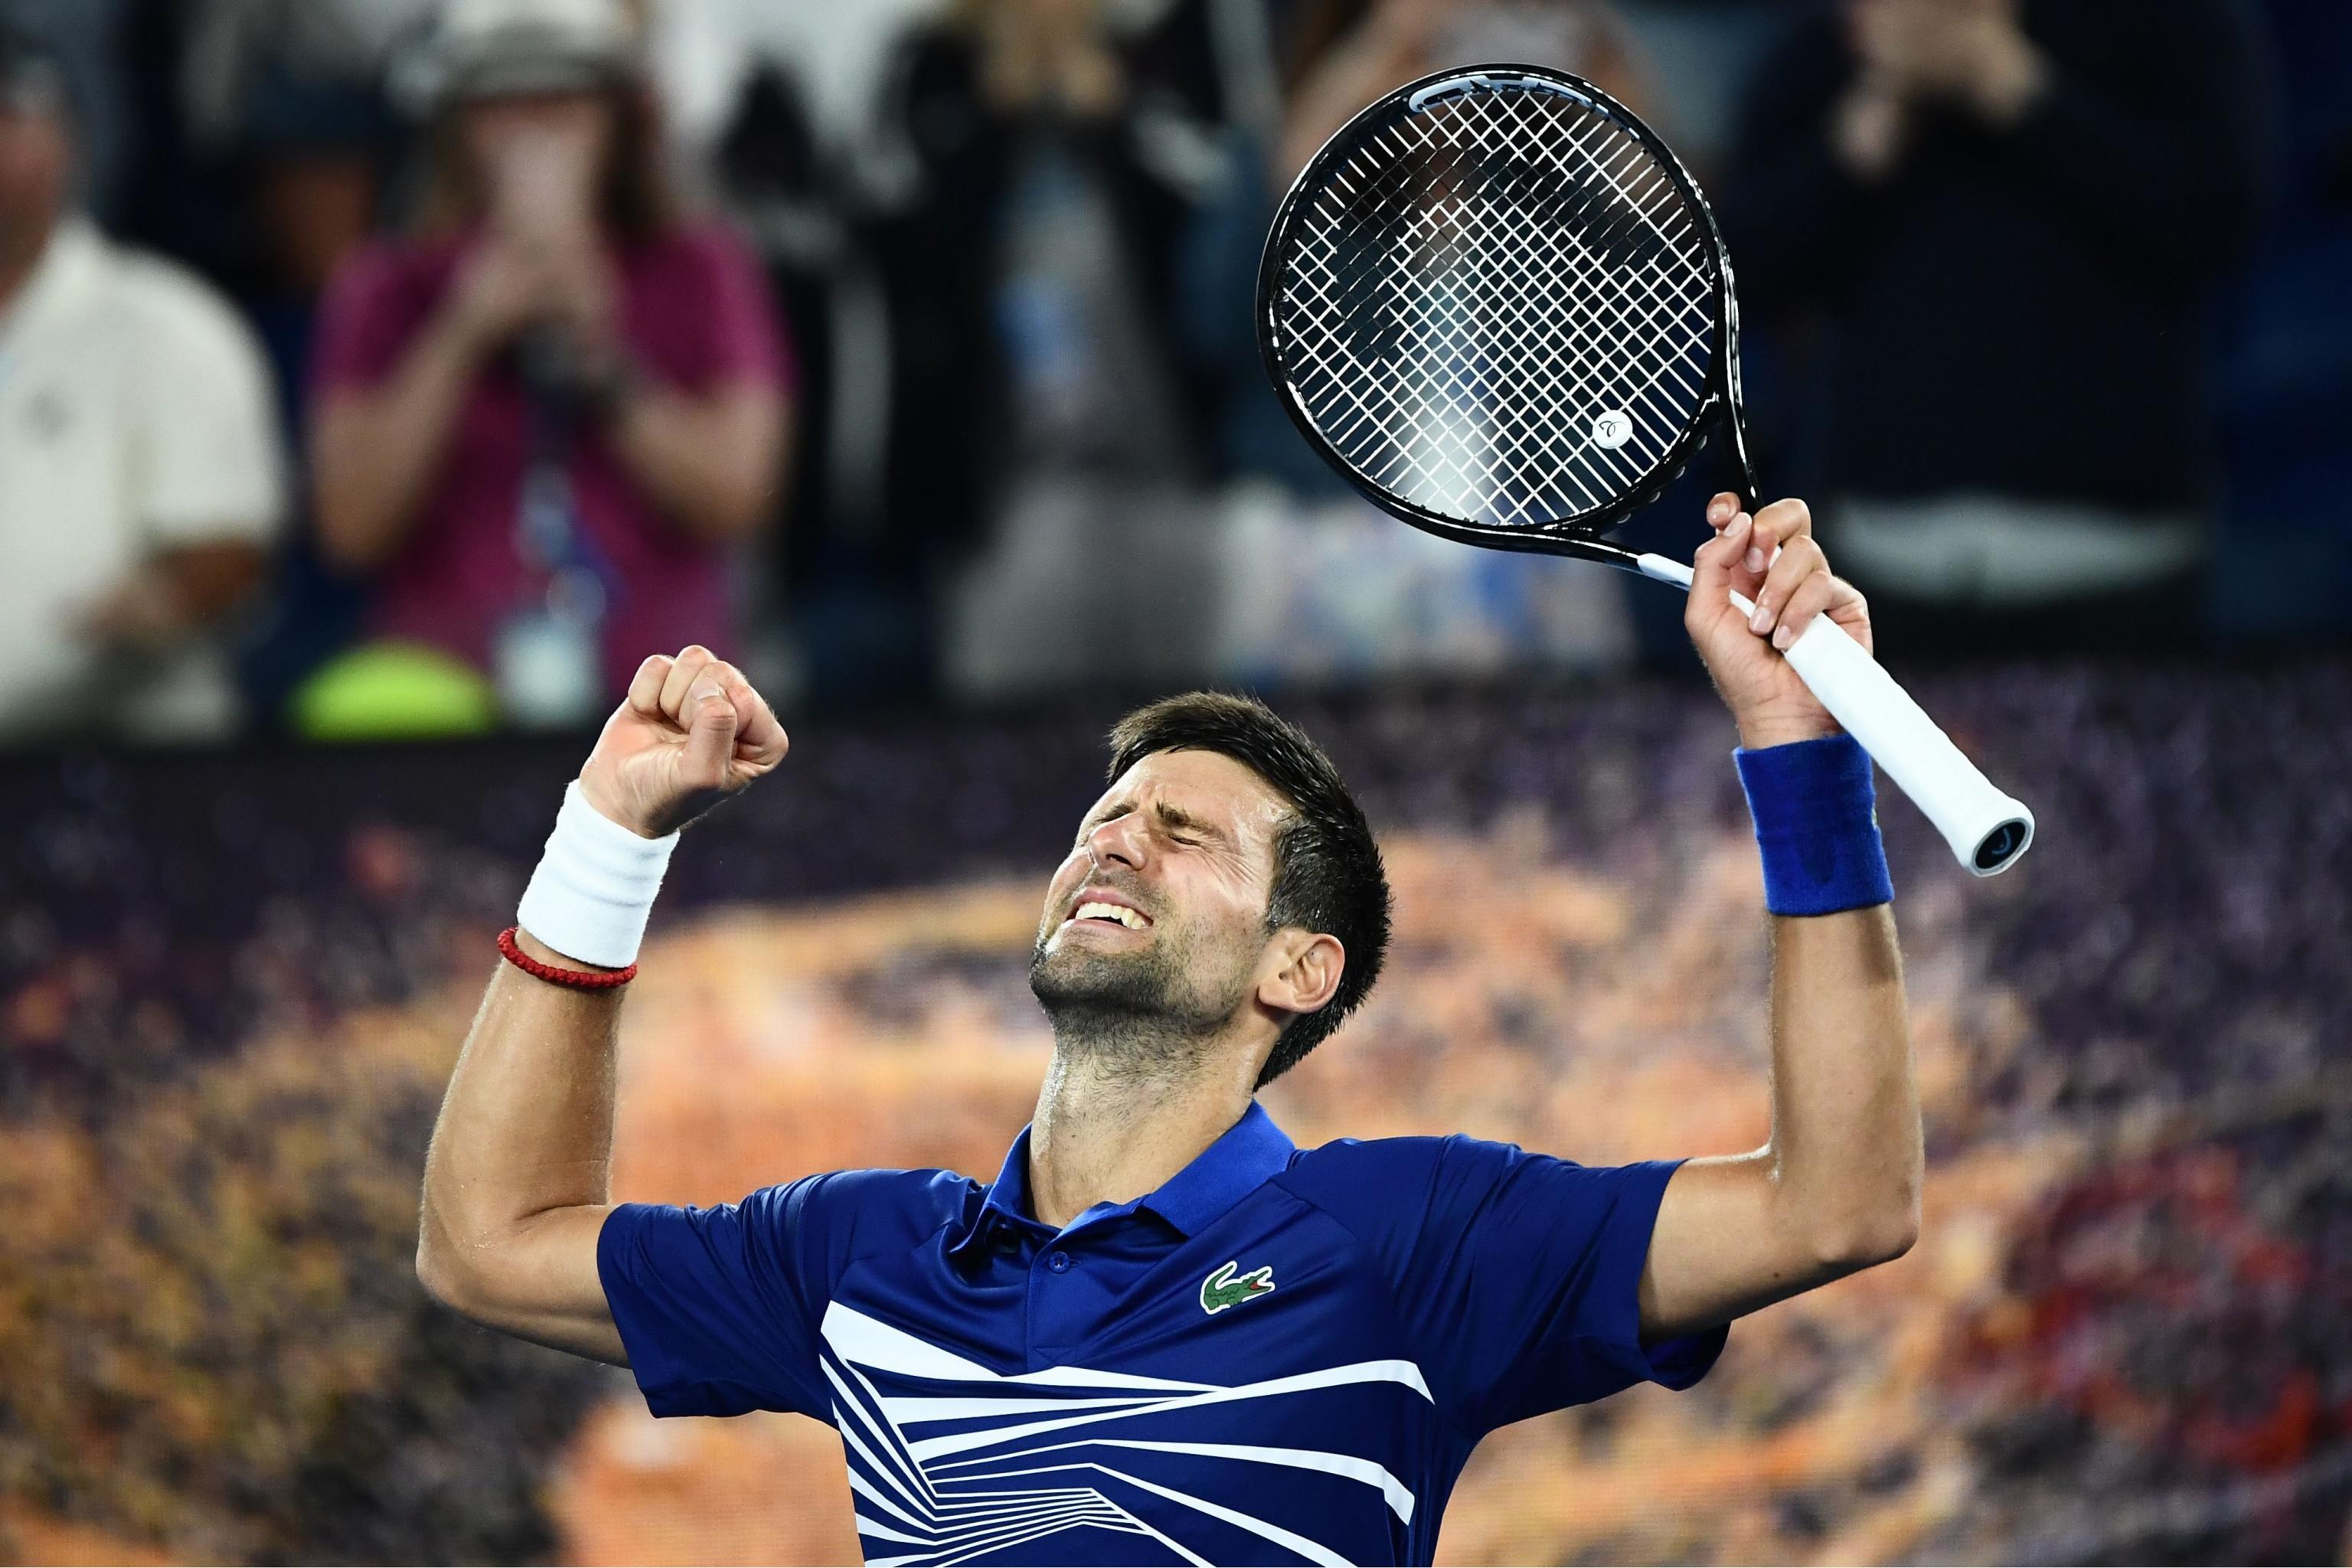 Australian Open 2019 Serena Williams Novak Djokovic Highlight Monday S Results Bleacher Report Latest News Videos And Highlights